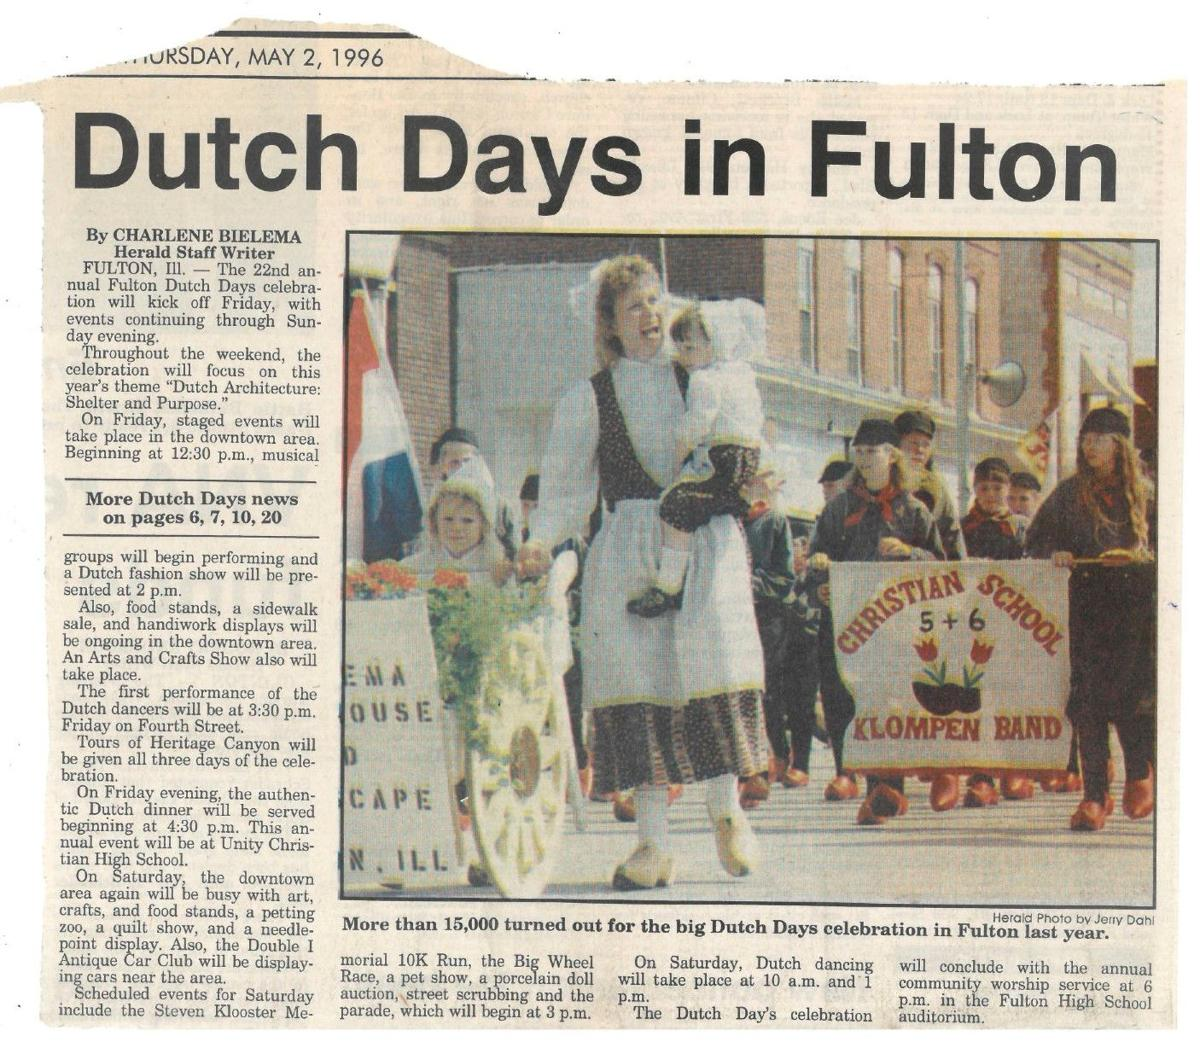 Dutch Days 1996 preview